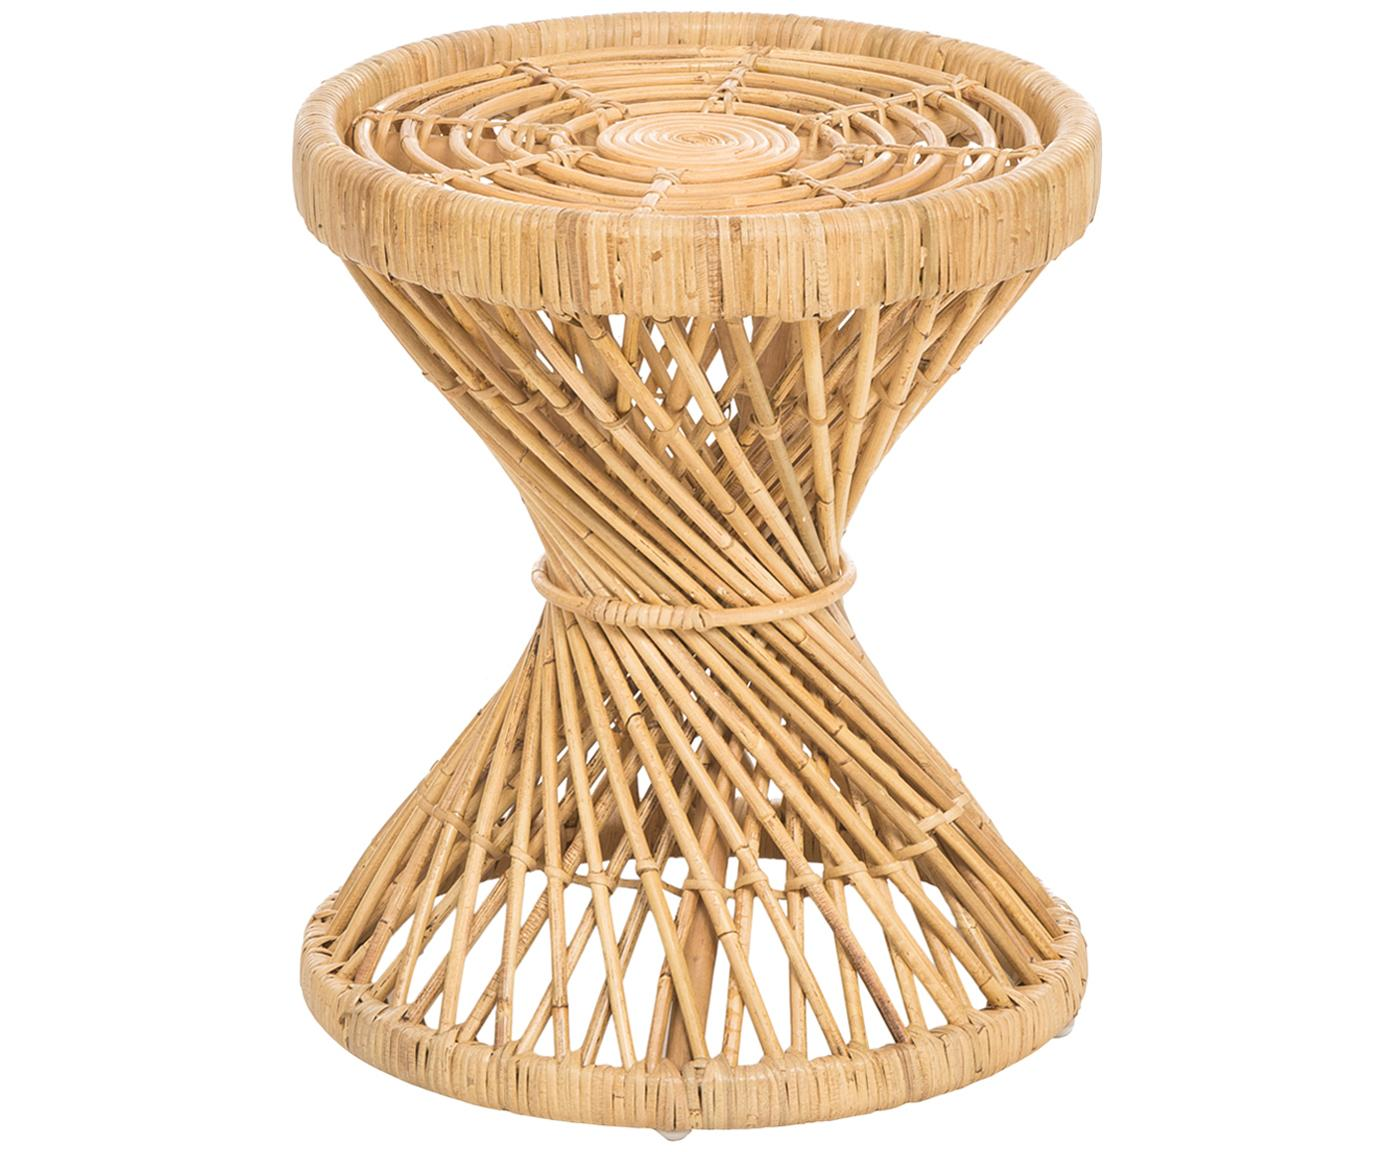 Tavolino boho in rattan Marvel, Rattan, finitura naturale, Rattan, finitura naturale, Ø 40 x A 47 cm